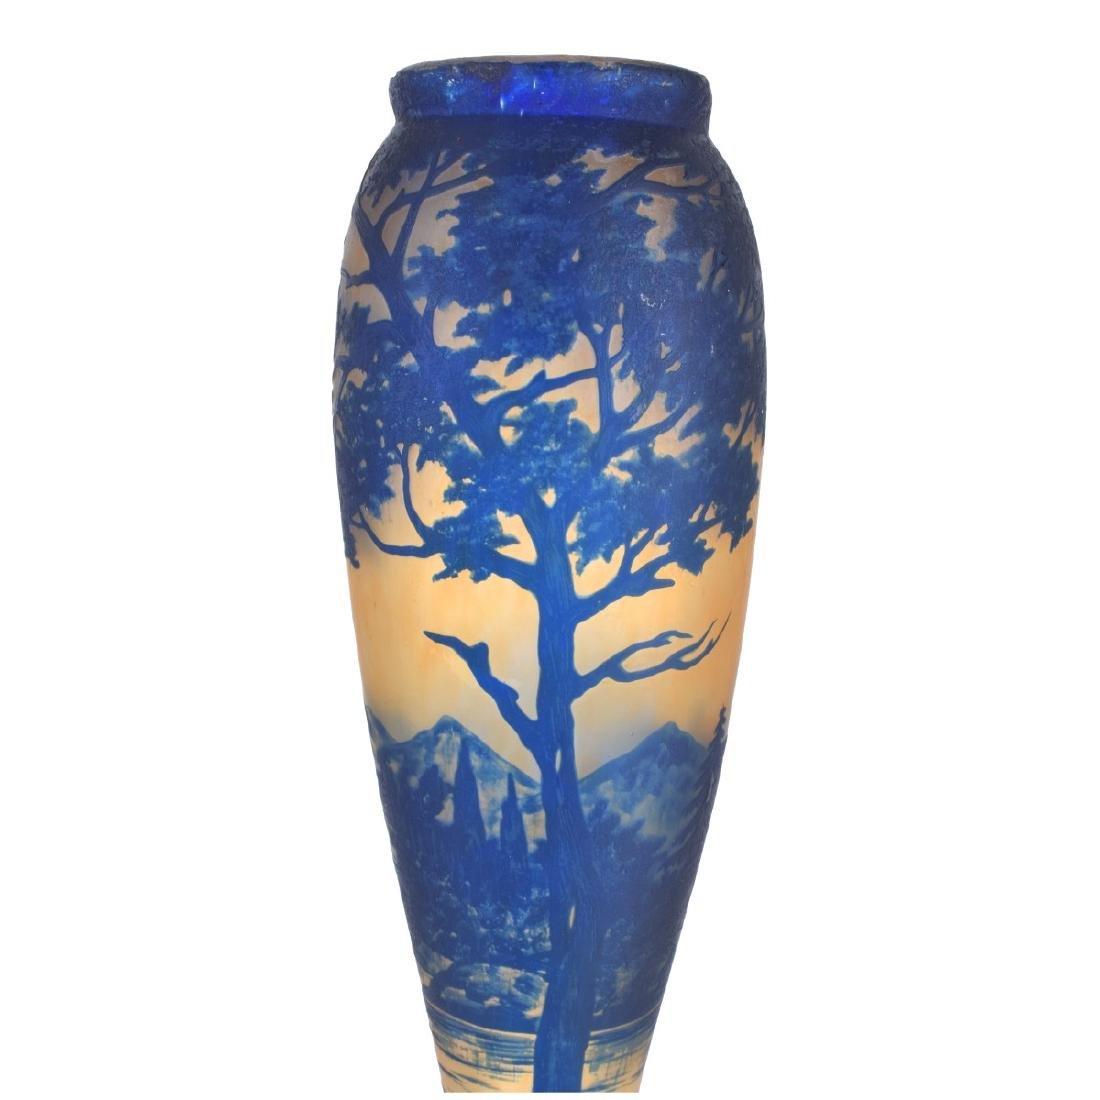 French Art Nouveau Cameo Glass Vase - 2